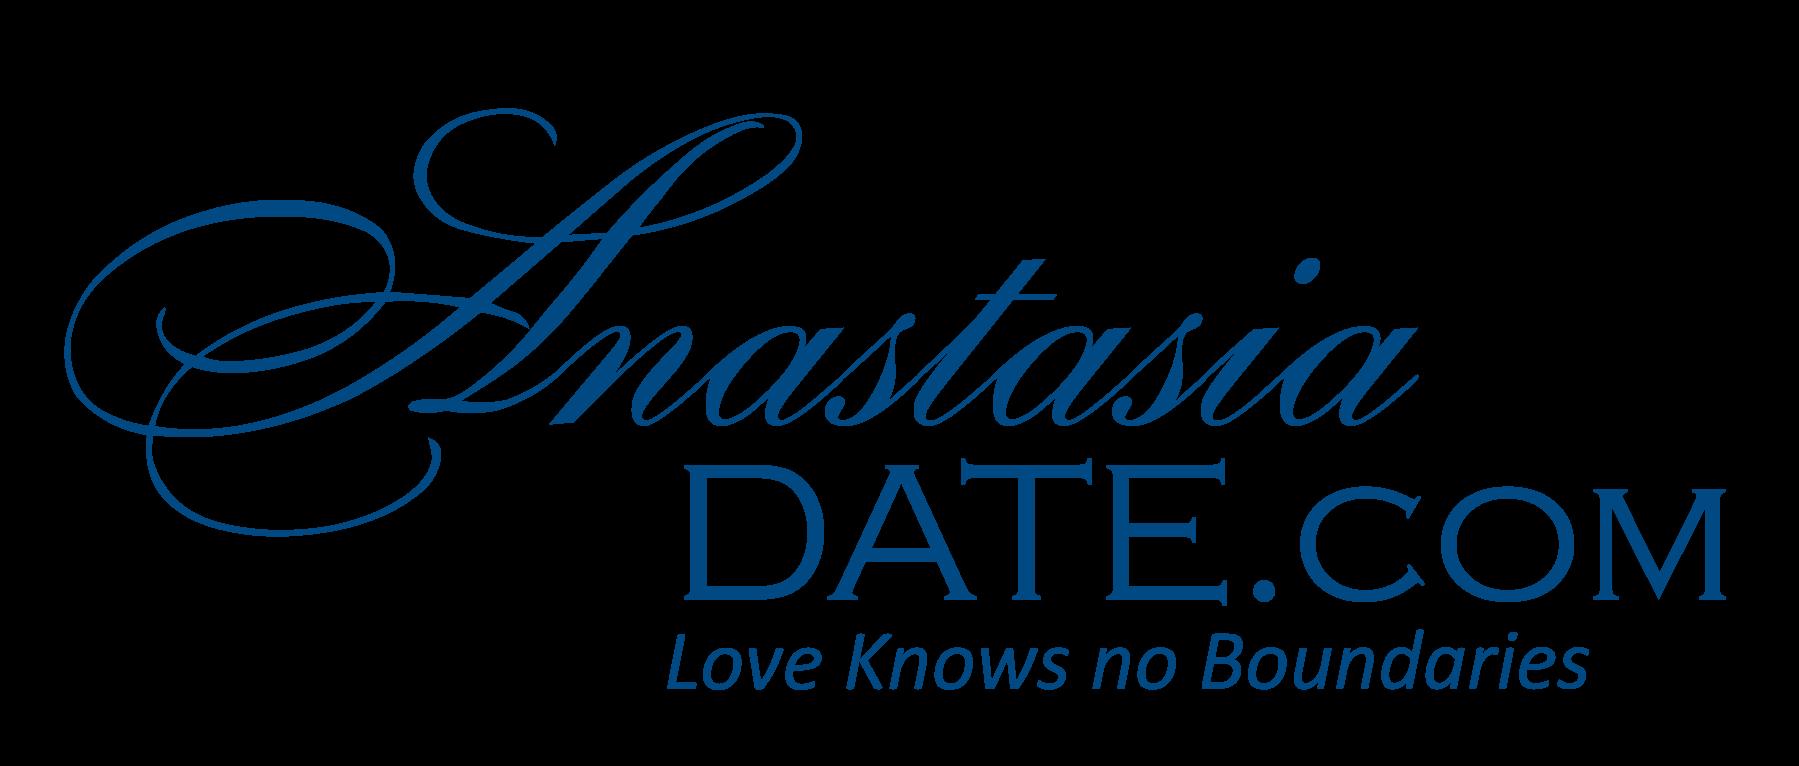 anastasia-date logo